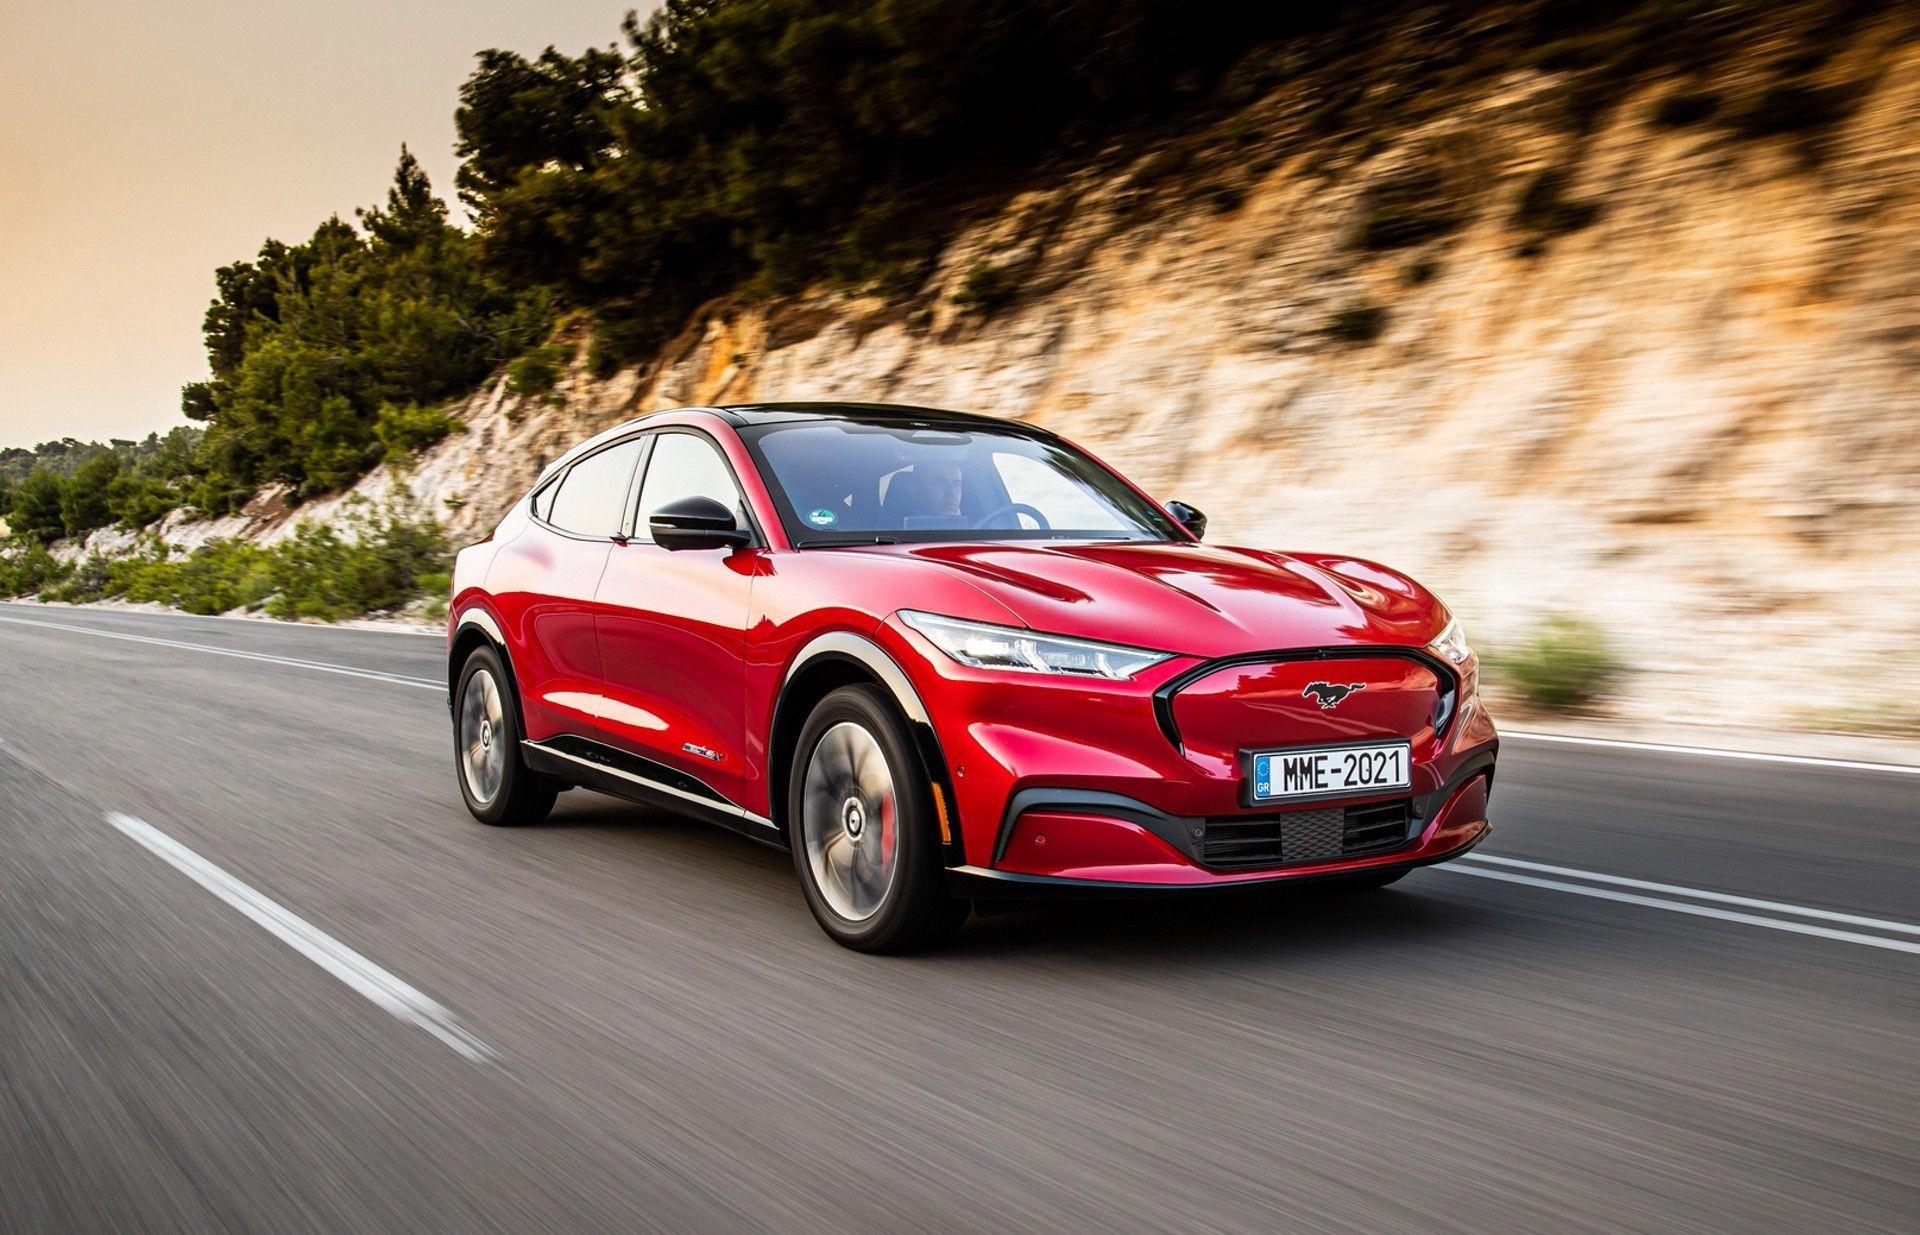 Ford_Mustang_Mach-E_greek_presskit-0107